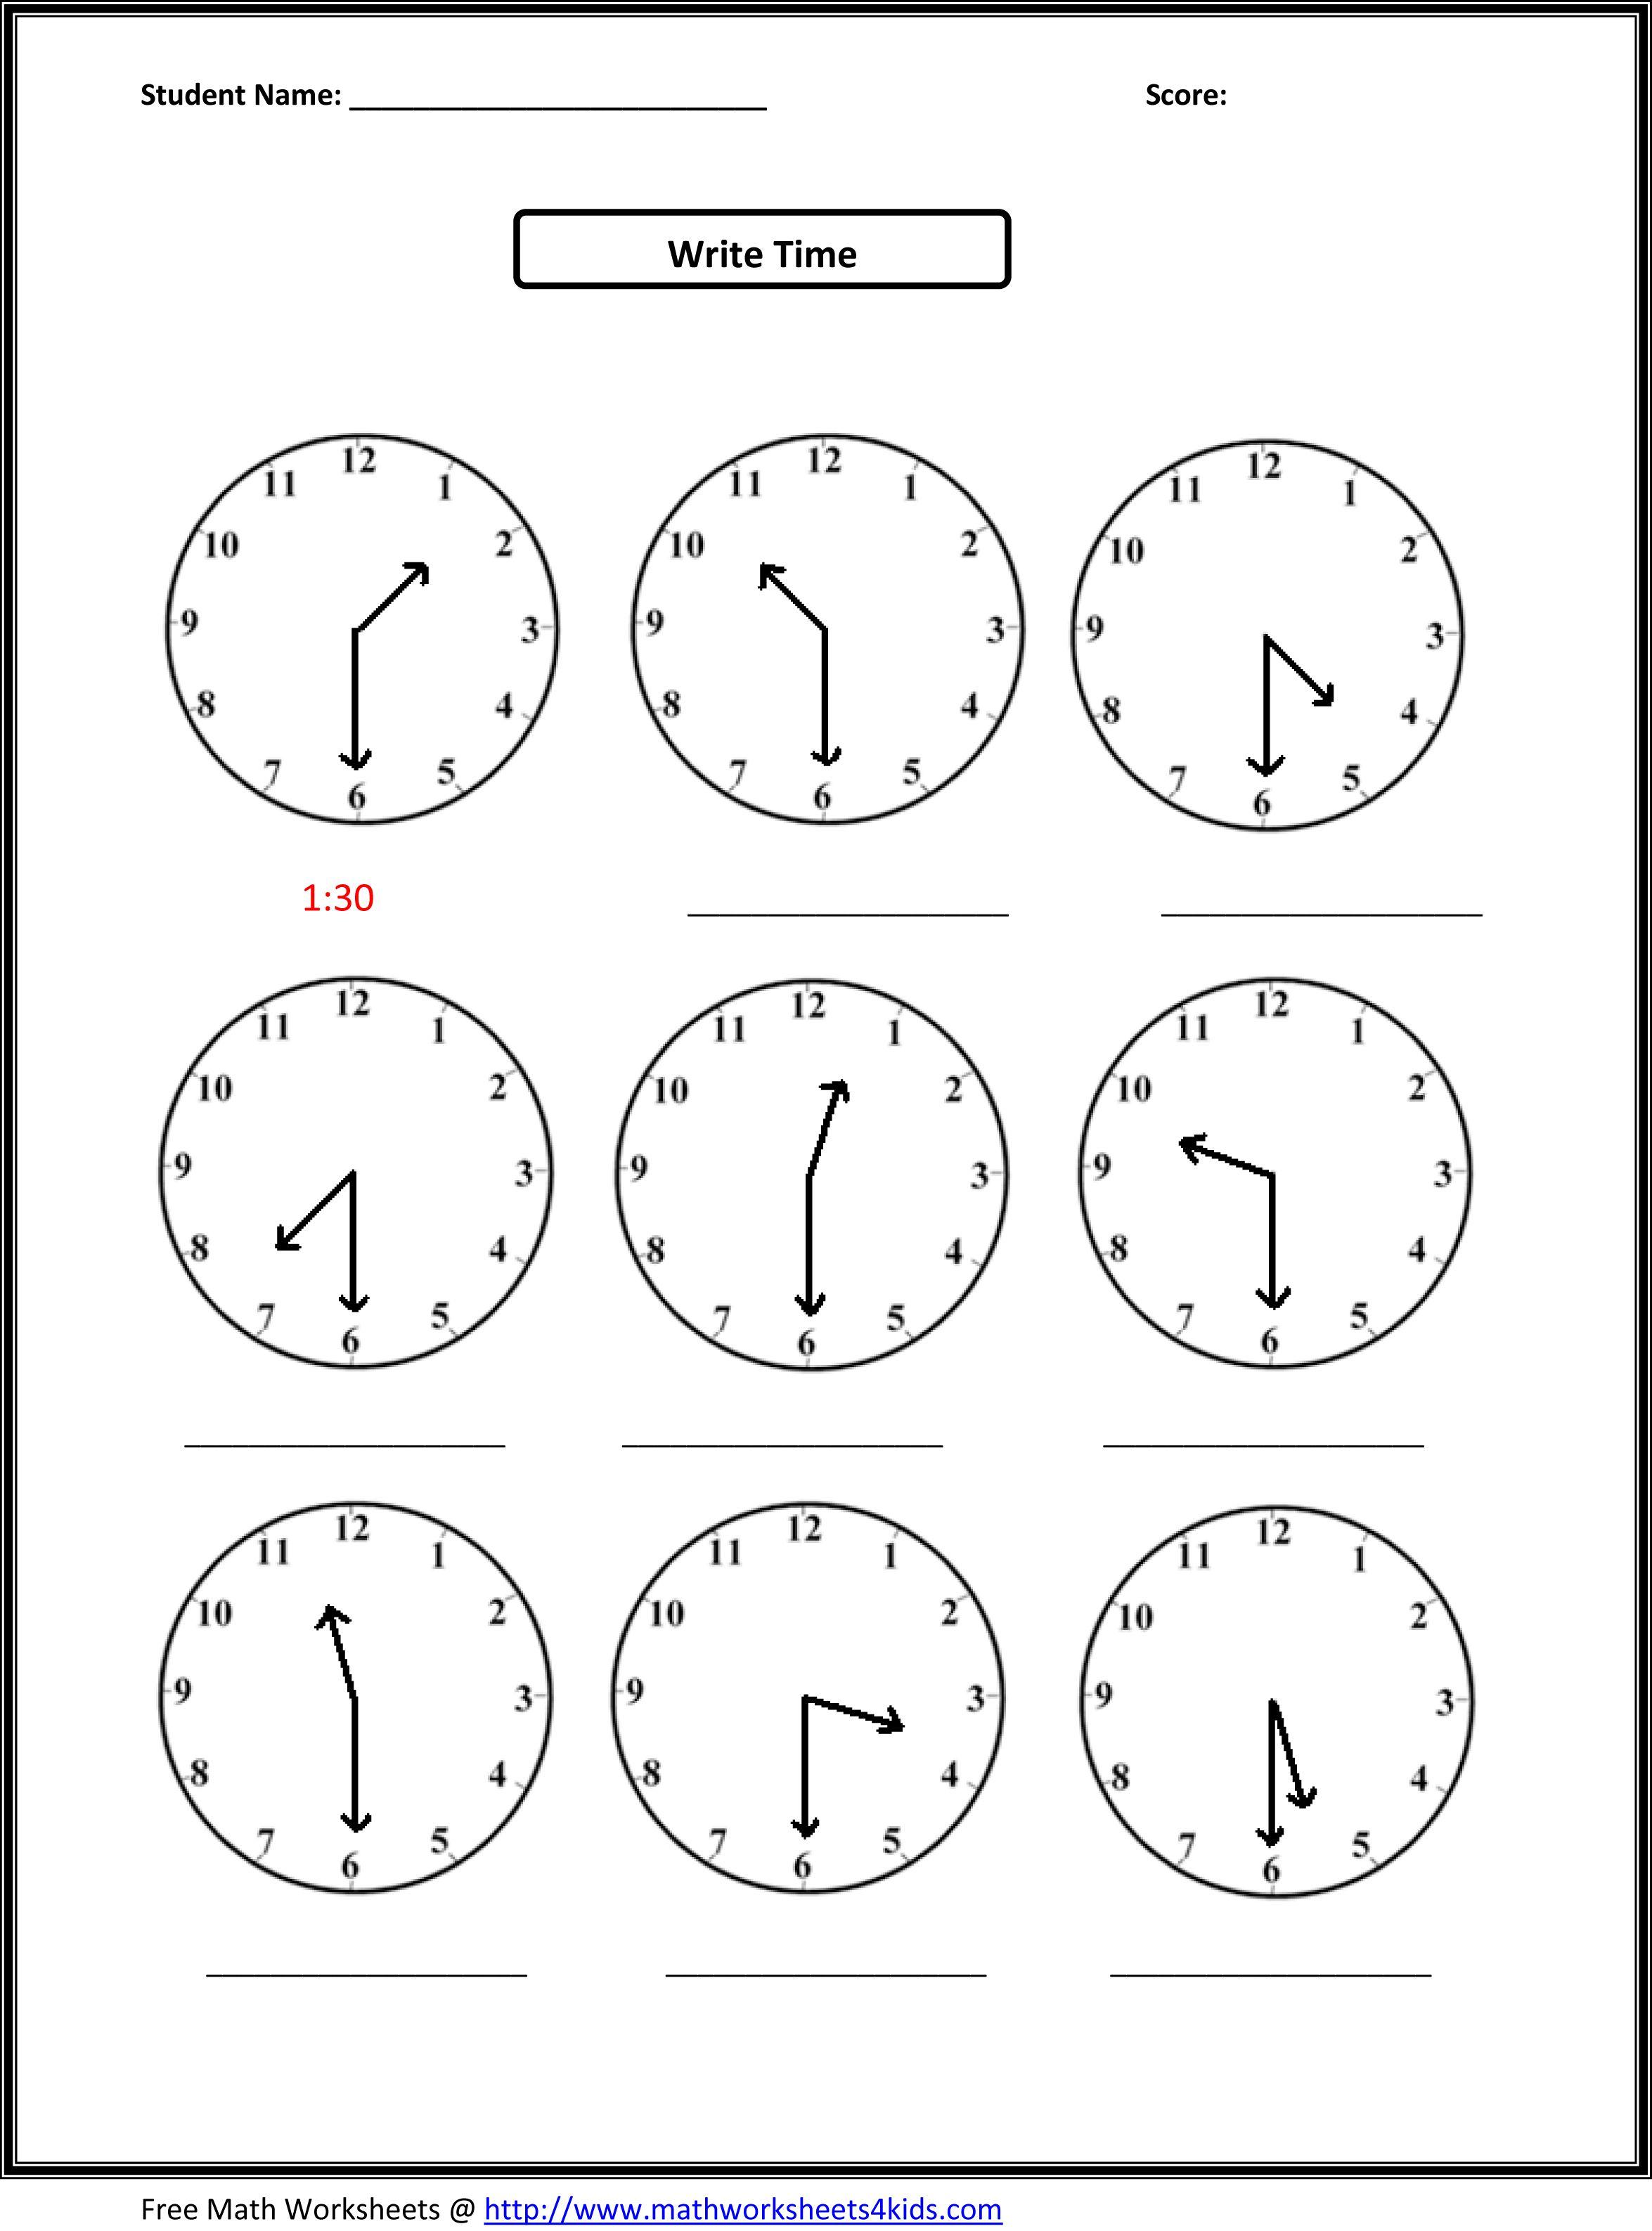 Math Worksheets 2nd Grade Printable 417957